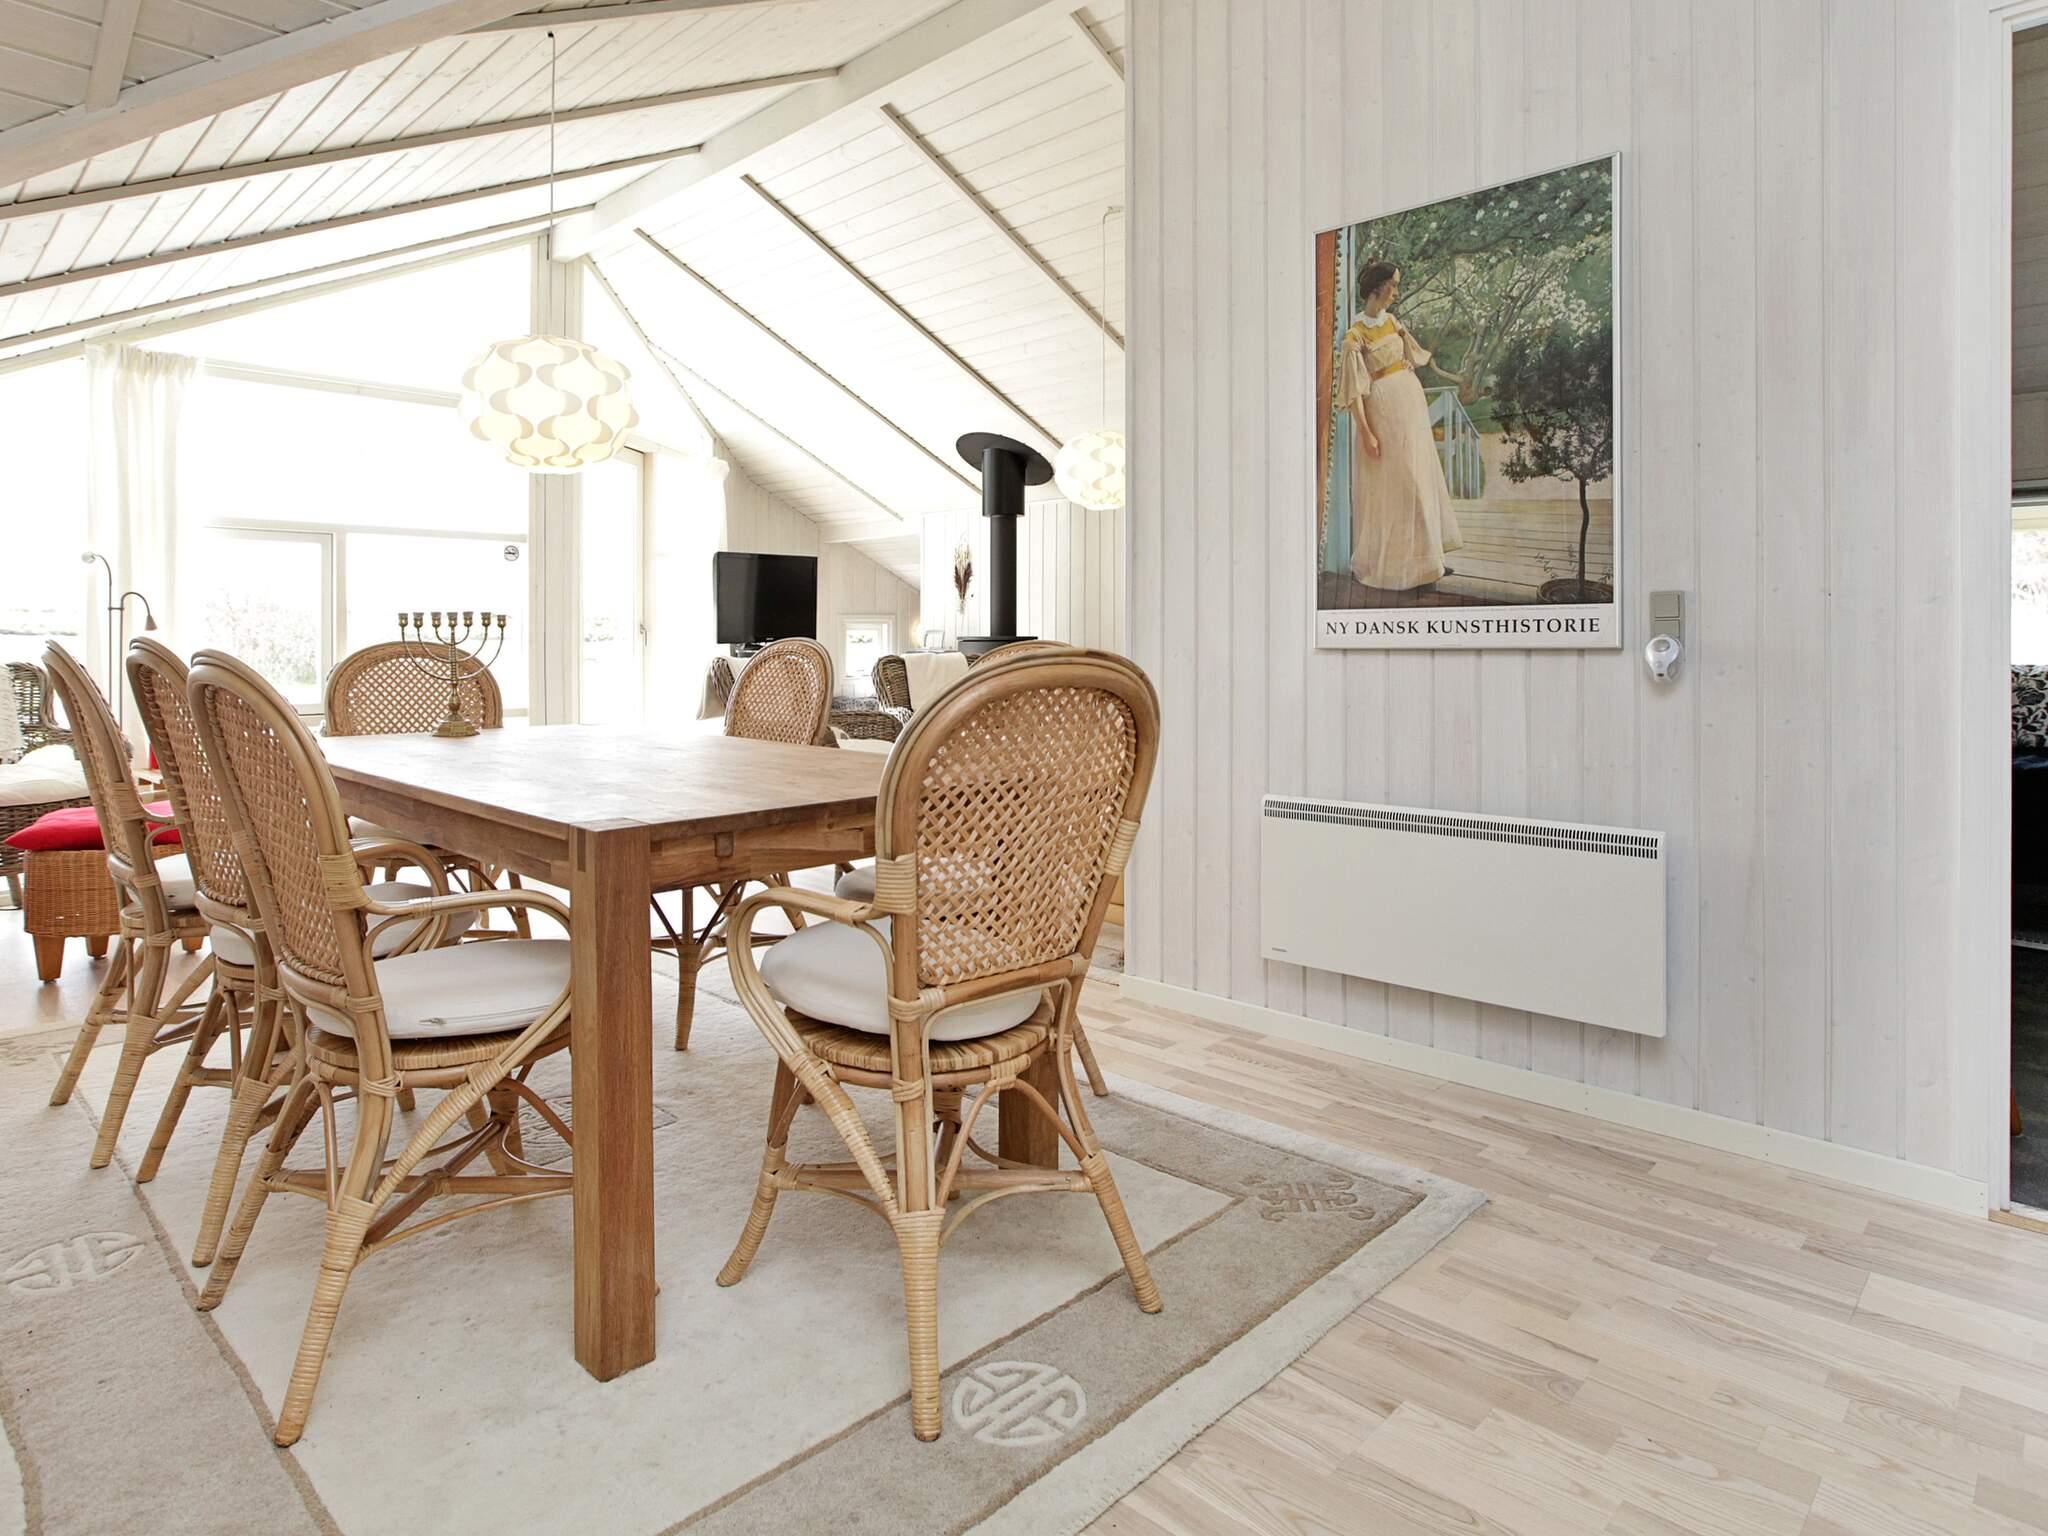 Ferienhaus Råbylille Strand (87316), Råbylille, , Møn, Dänemark, Bild 8